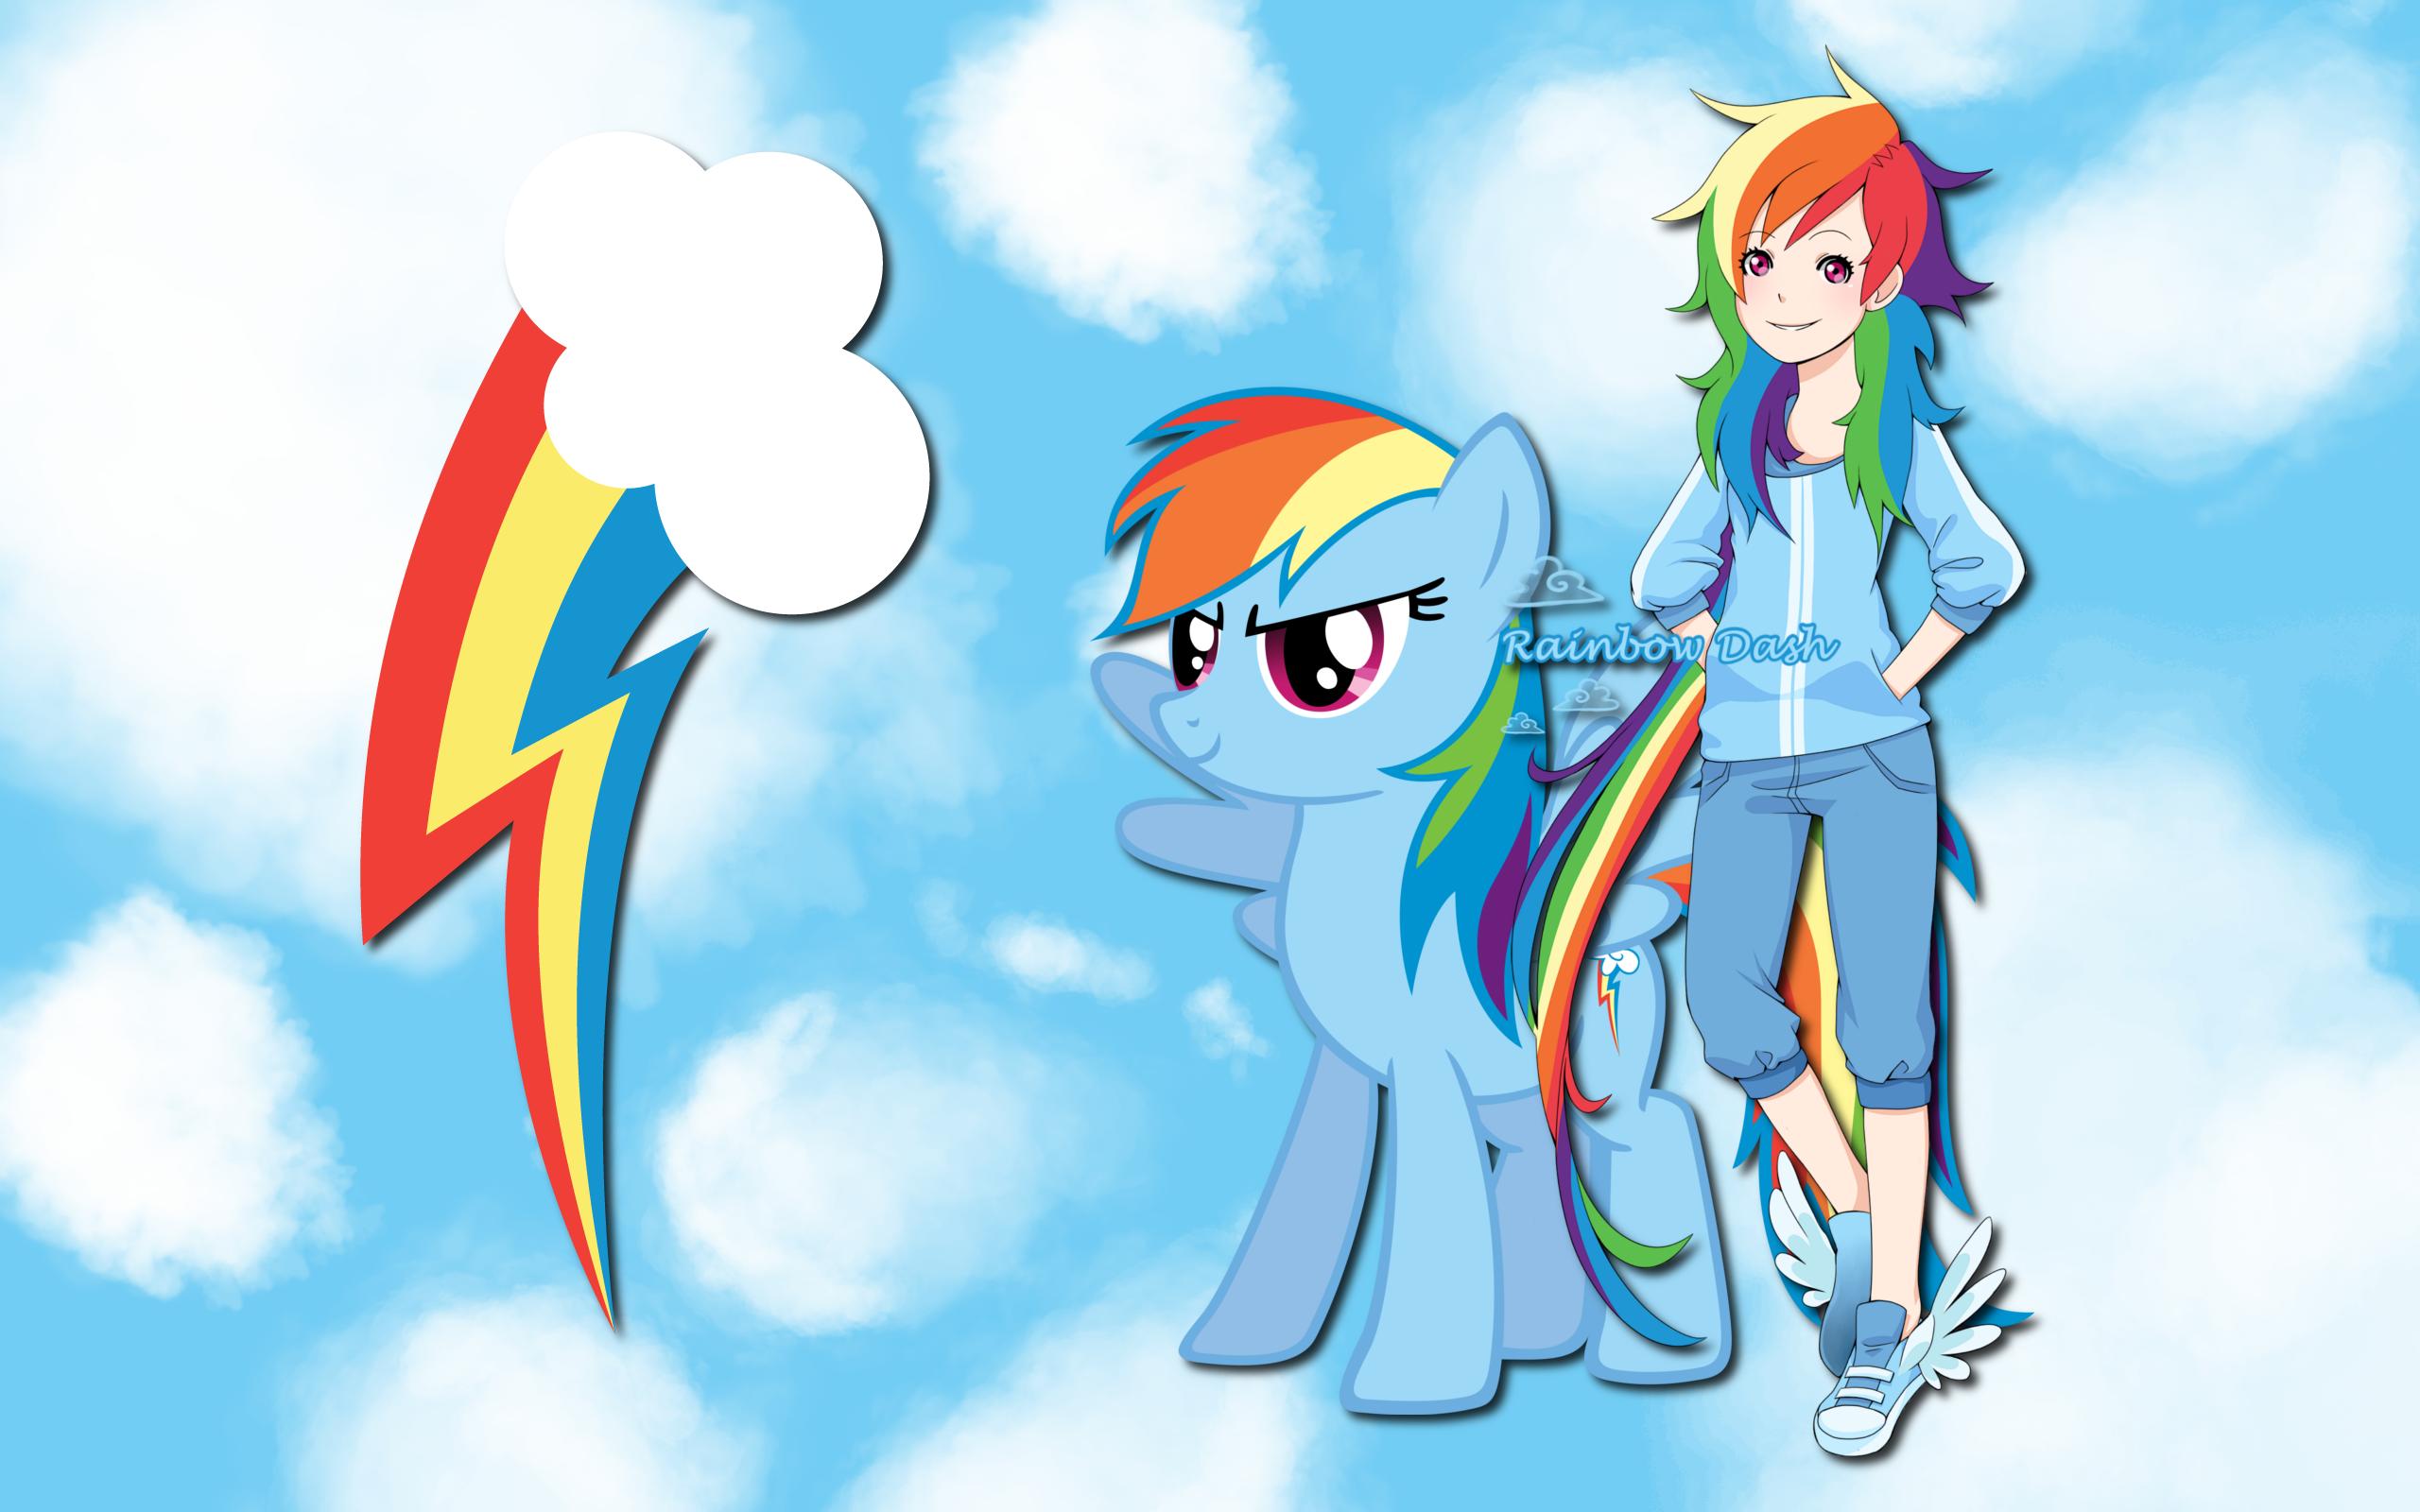 Human Rainbow Dash WP by AliceHumanSacrifice0, Lilacinum, MoongazePonies and ooklah